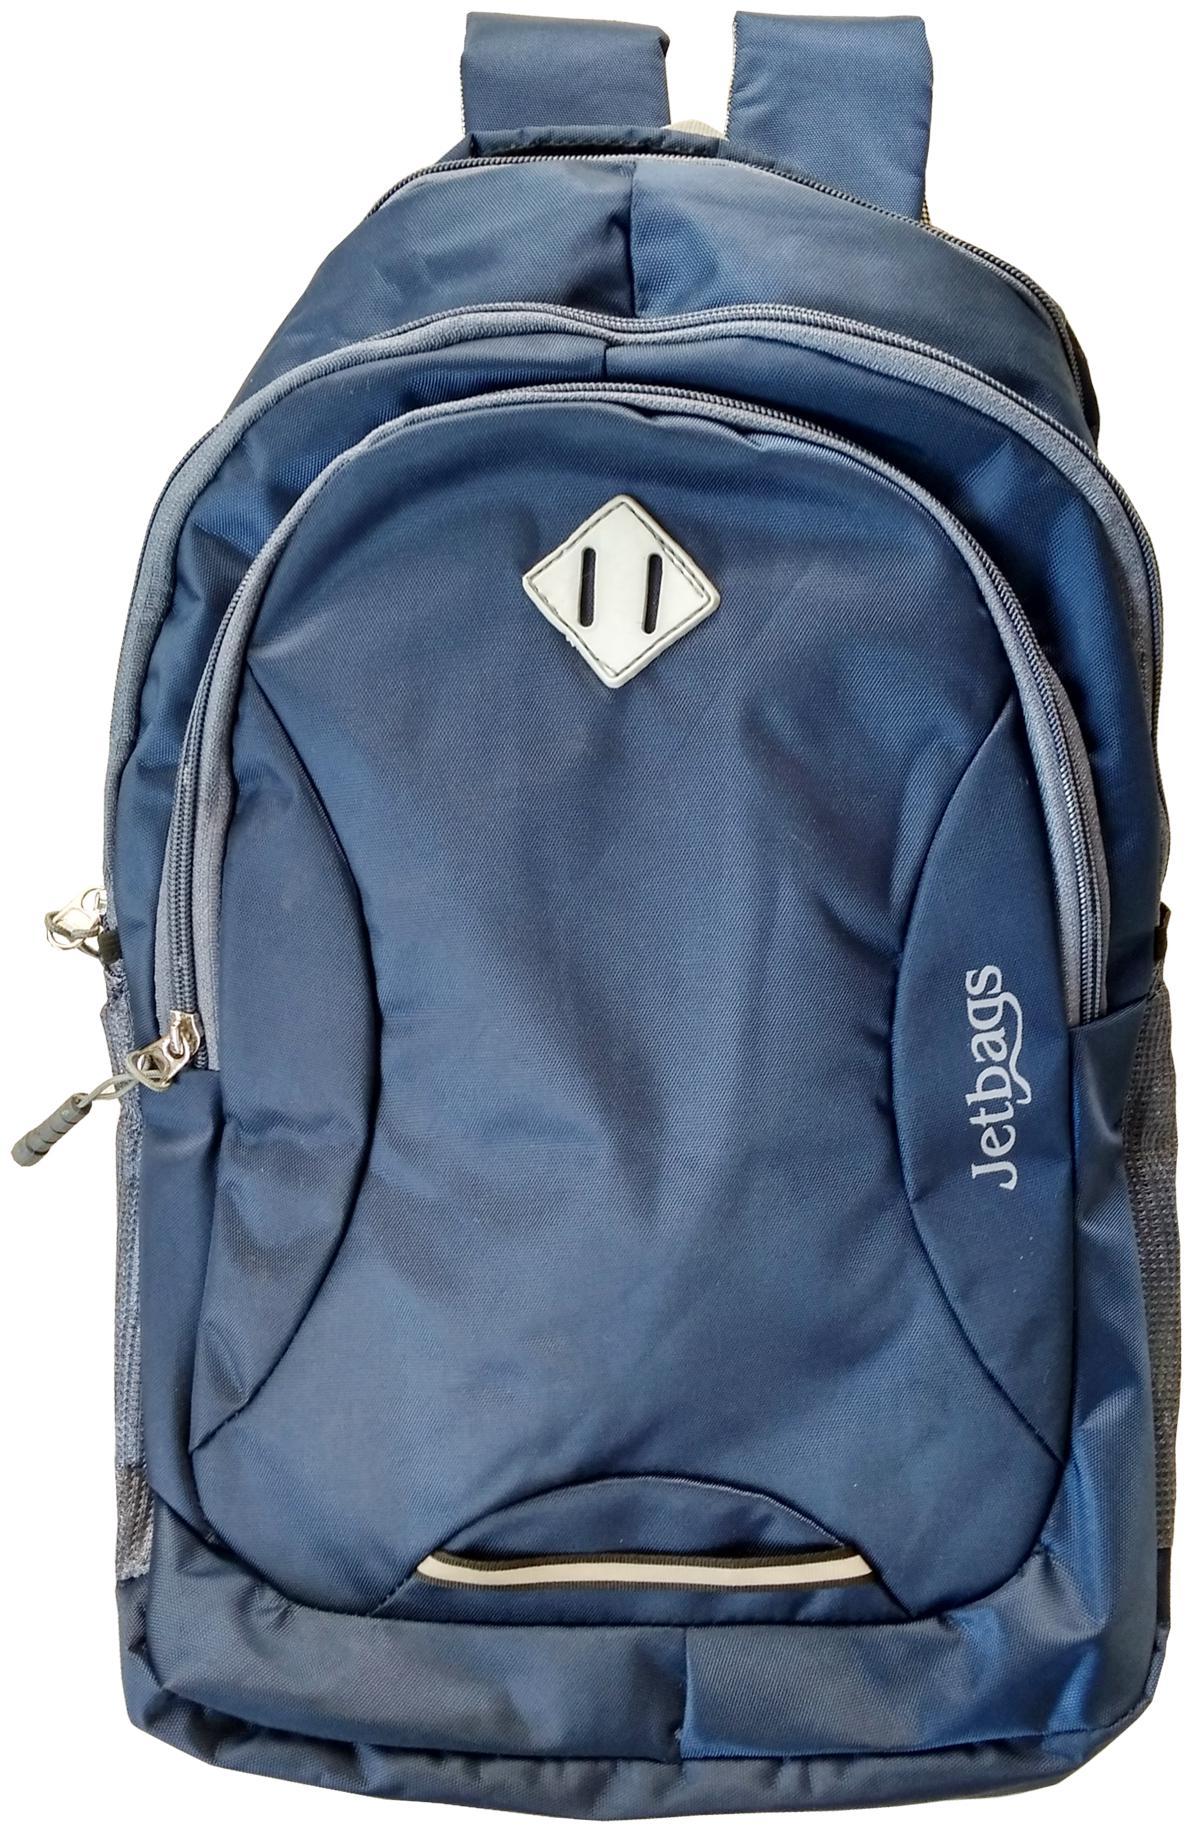 JetBags 20 L Backpack   School bag   Blue